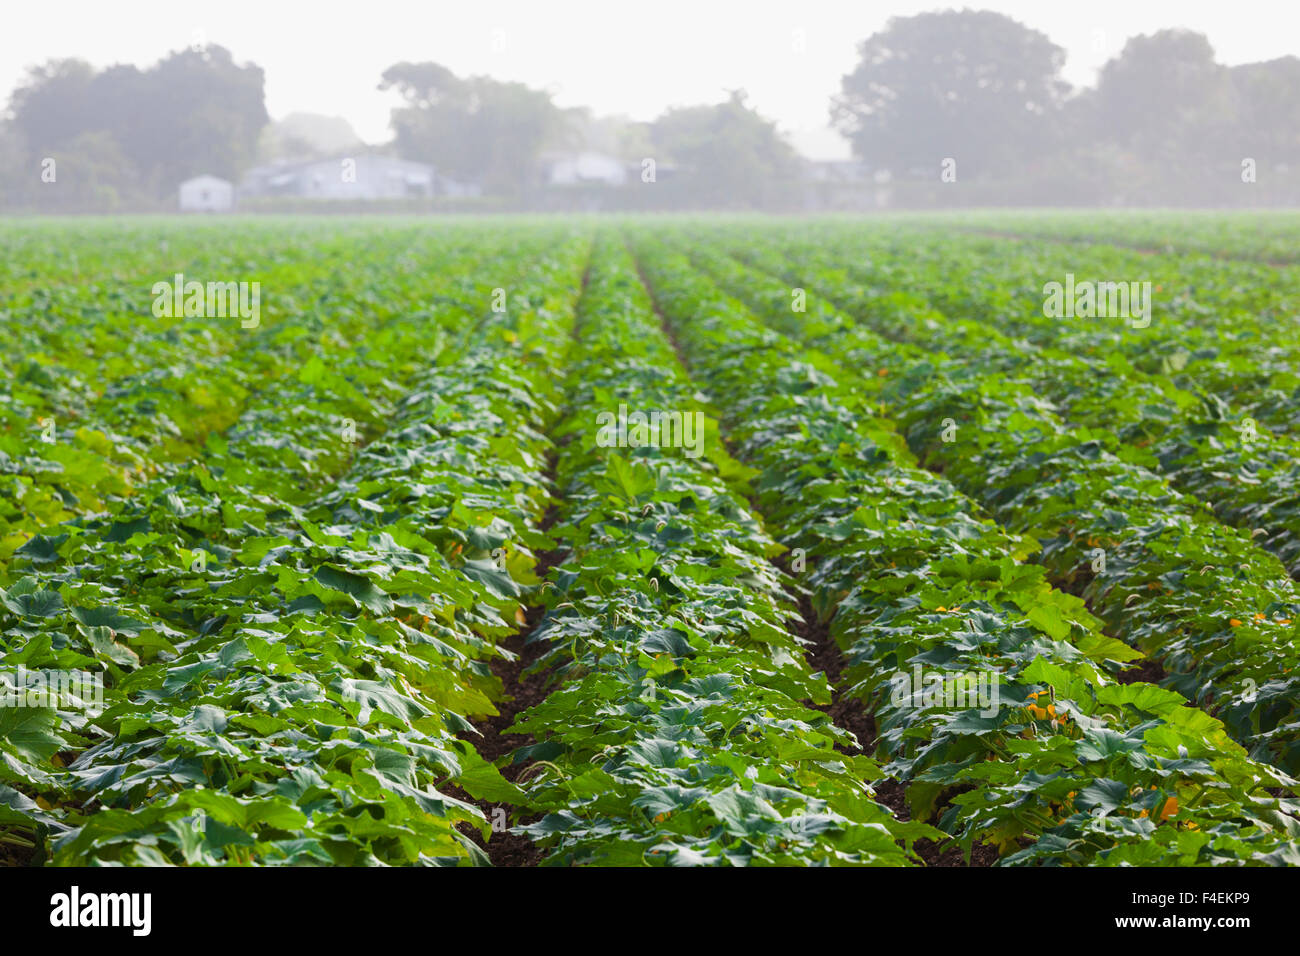 USA, Florida, Homestead, farm and fields. - Stock Image